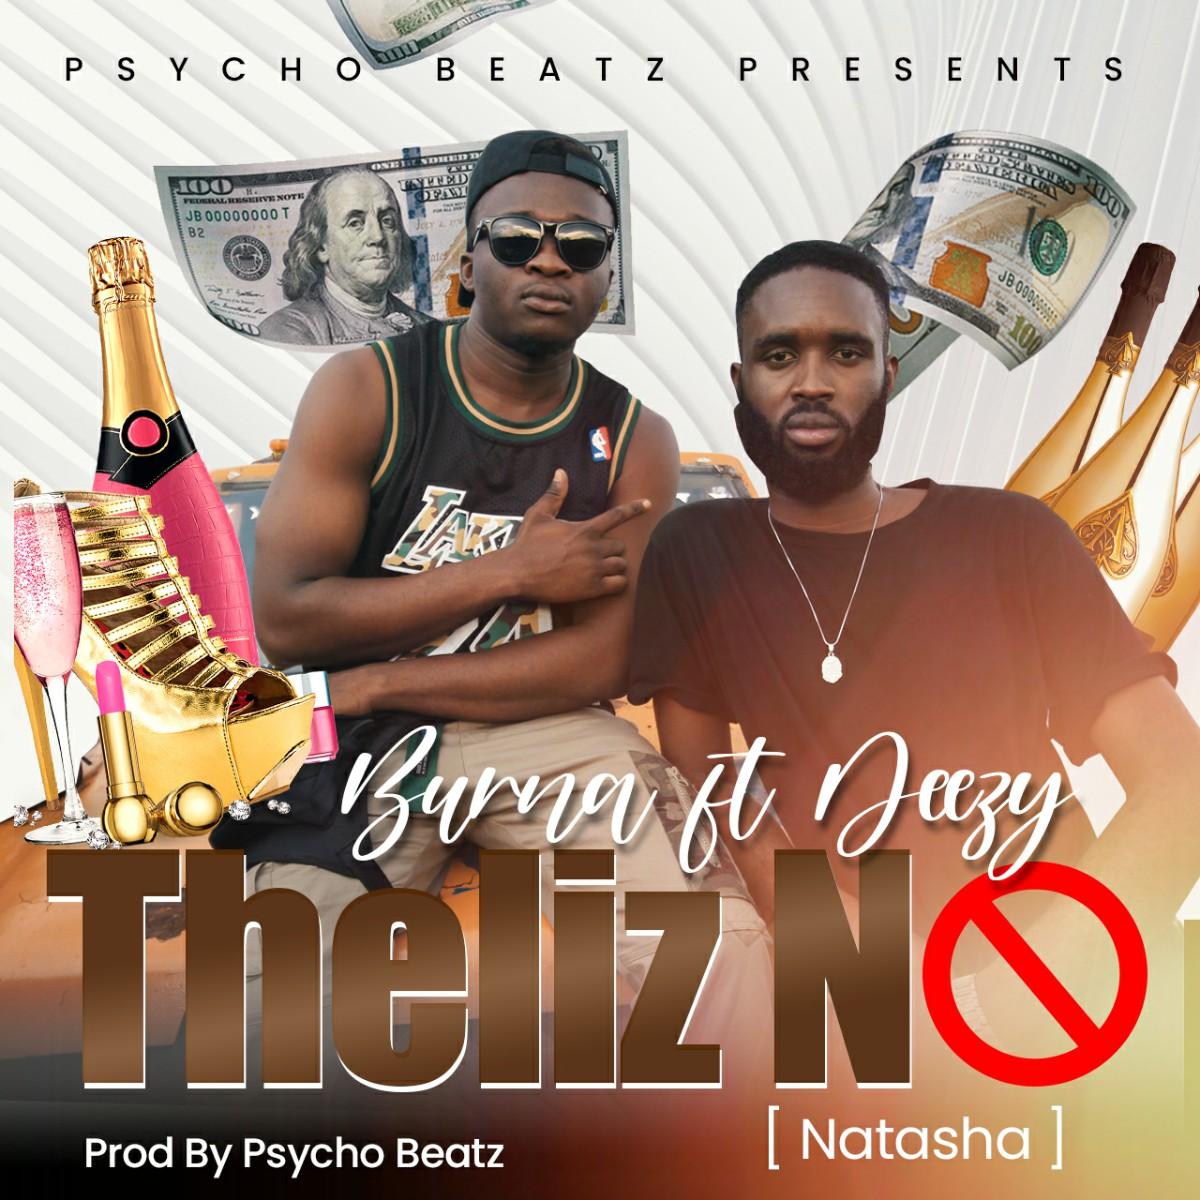 Burna ft. Deezy - Theliz No (Prod. Psycho Beatz)